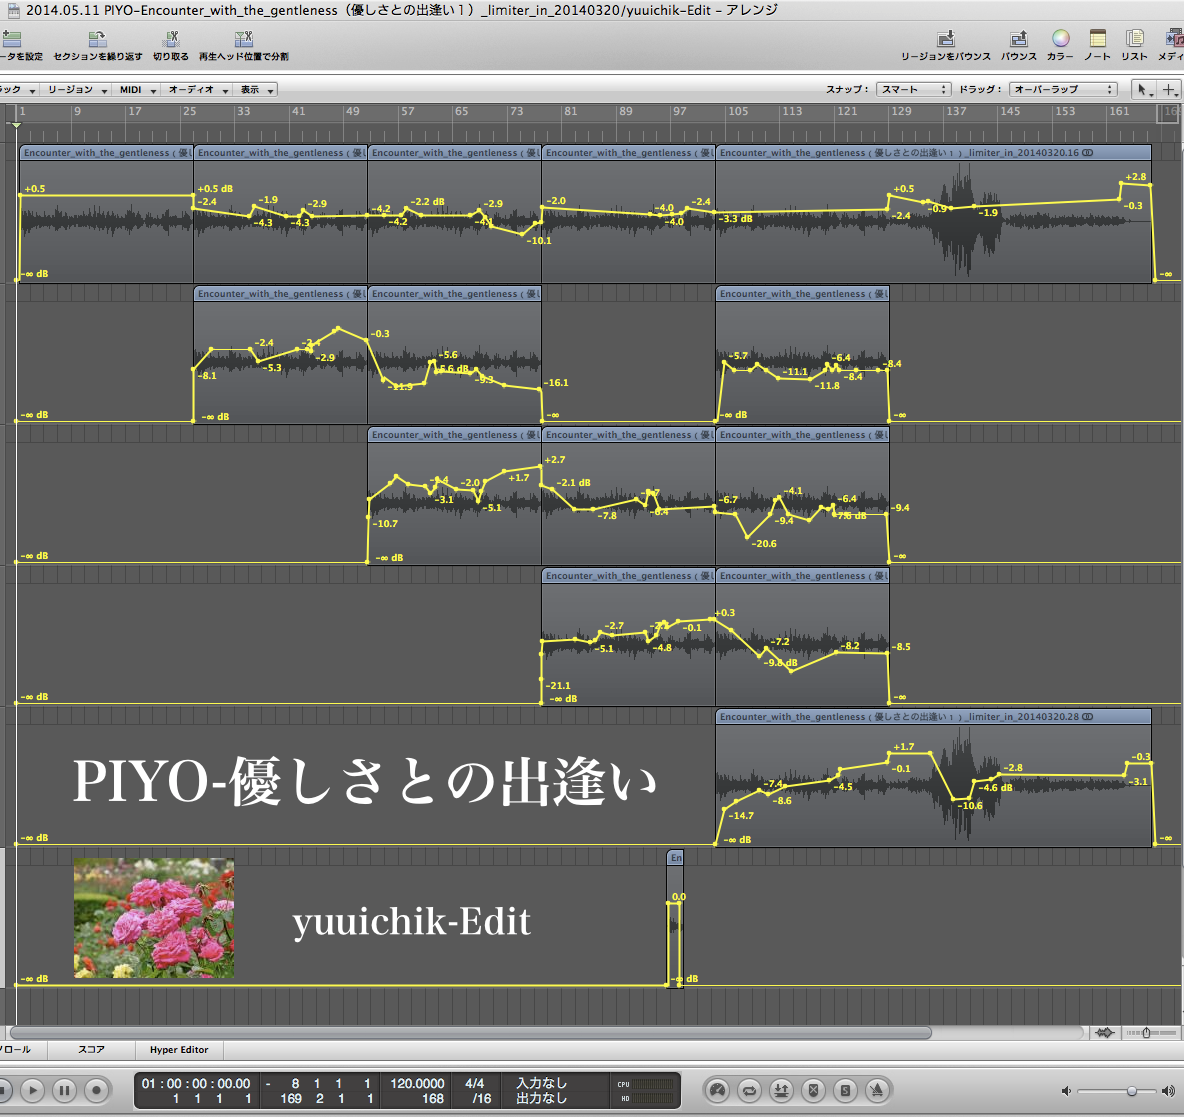 PIYO-Encounter with the gentleness/yuuichik-Edit